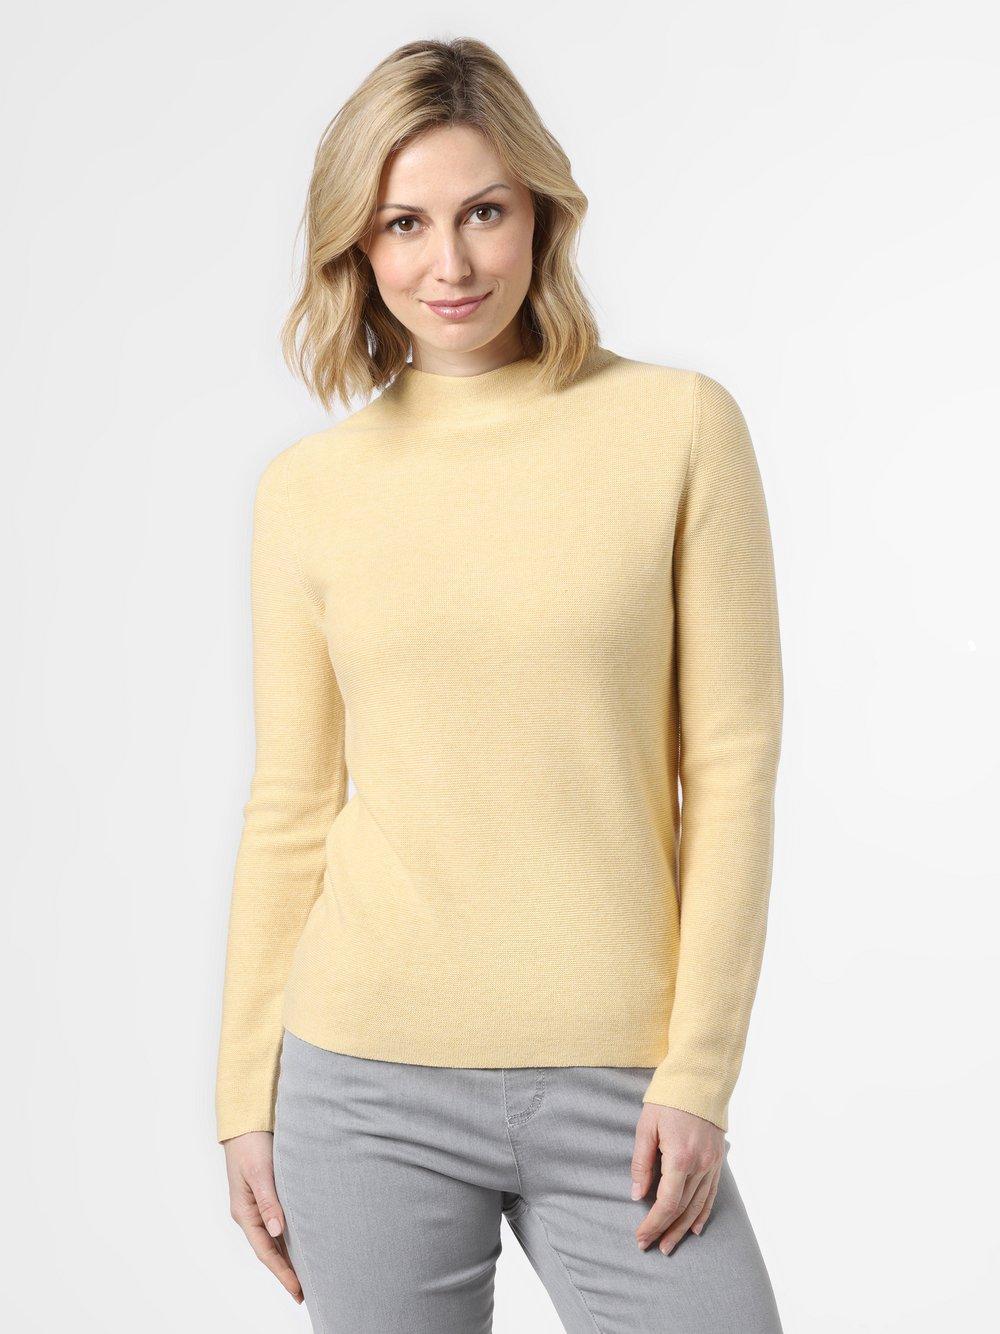 Franco Callegari - Sweter damski, żółty